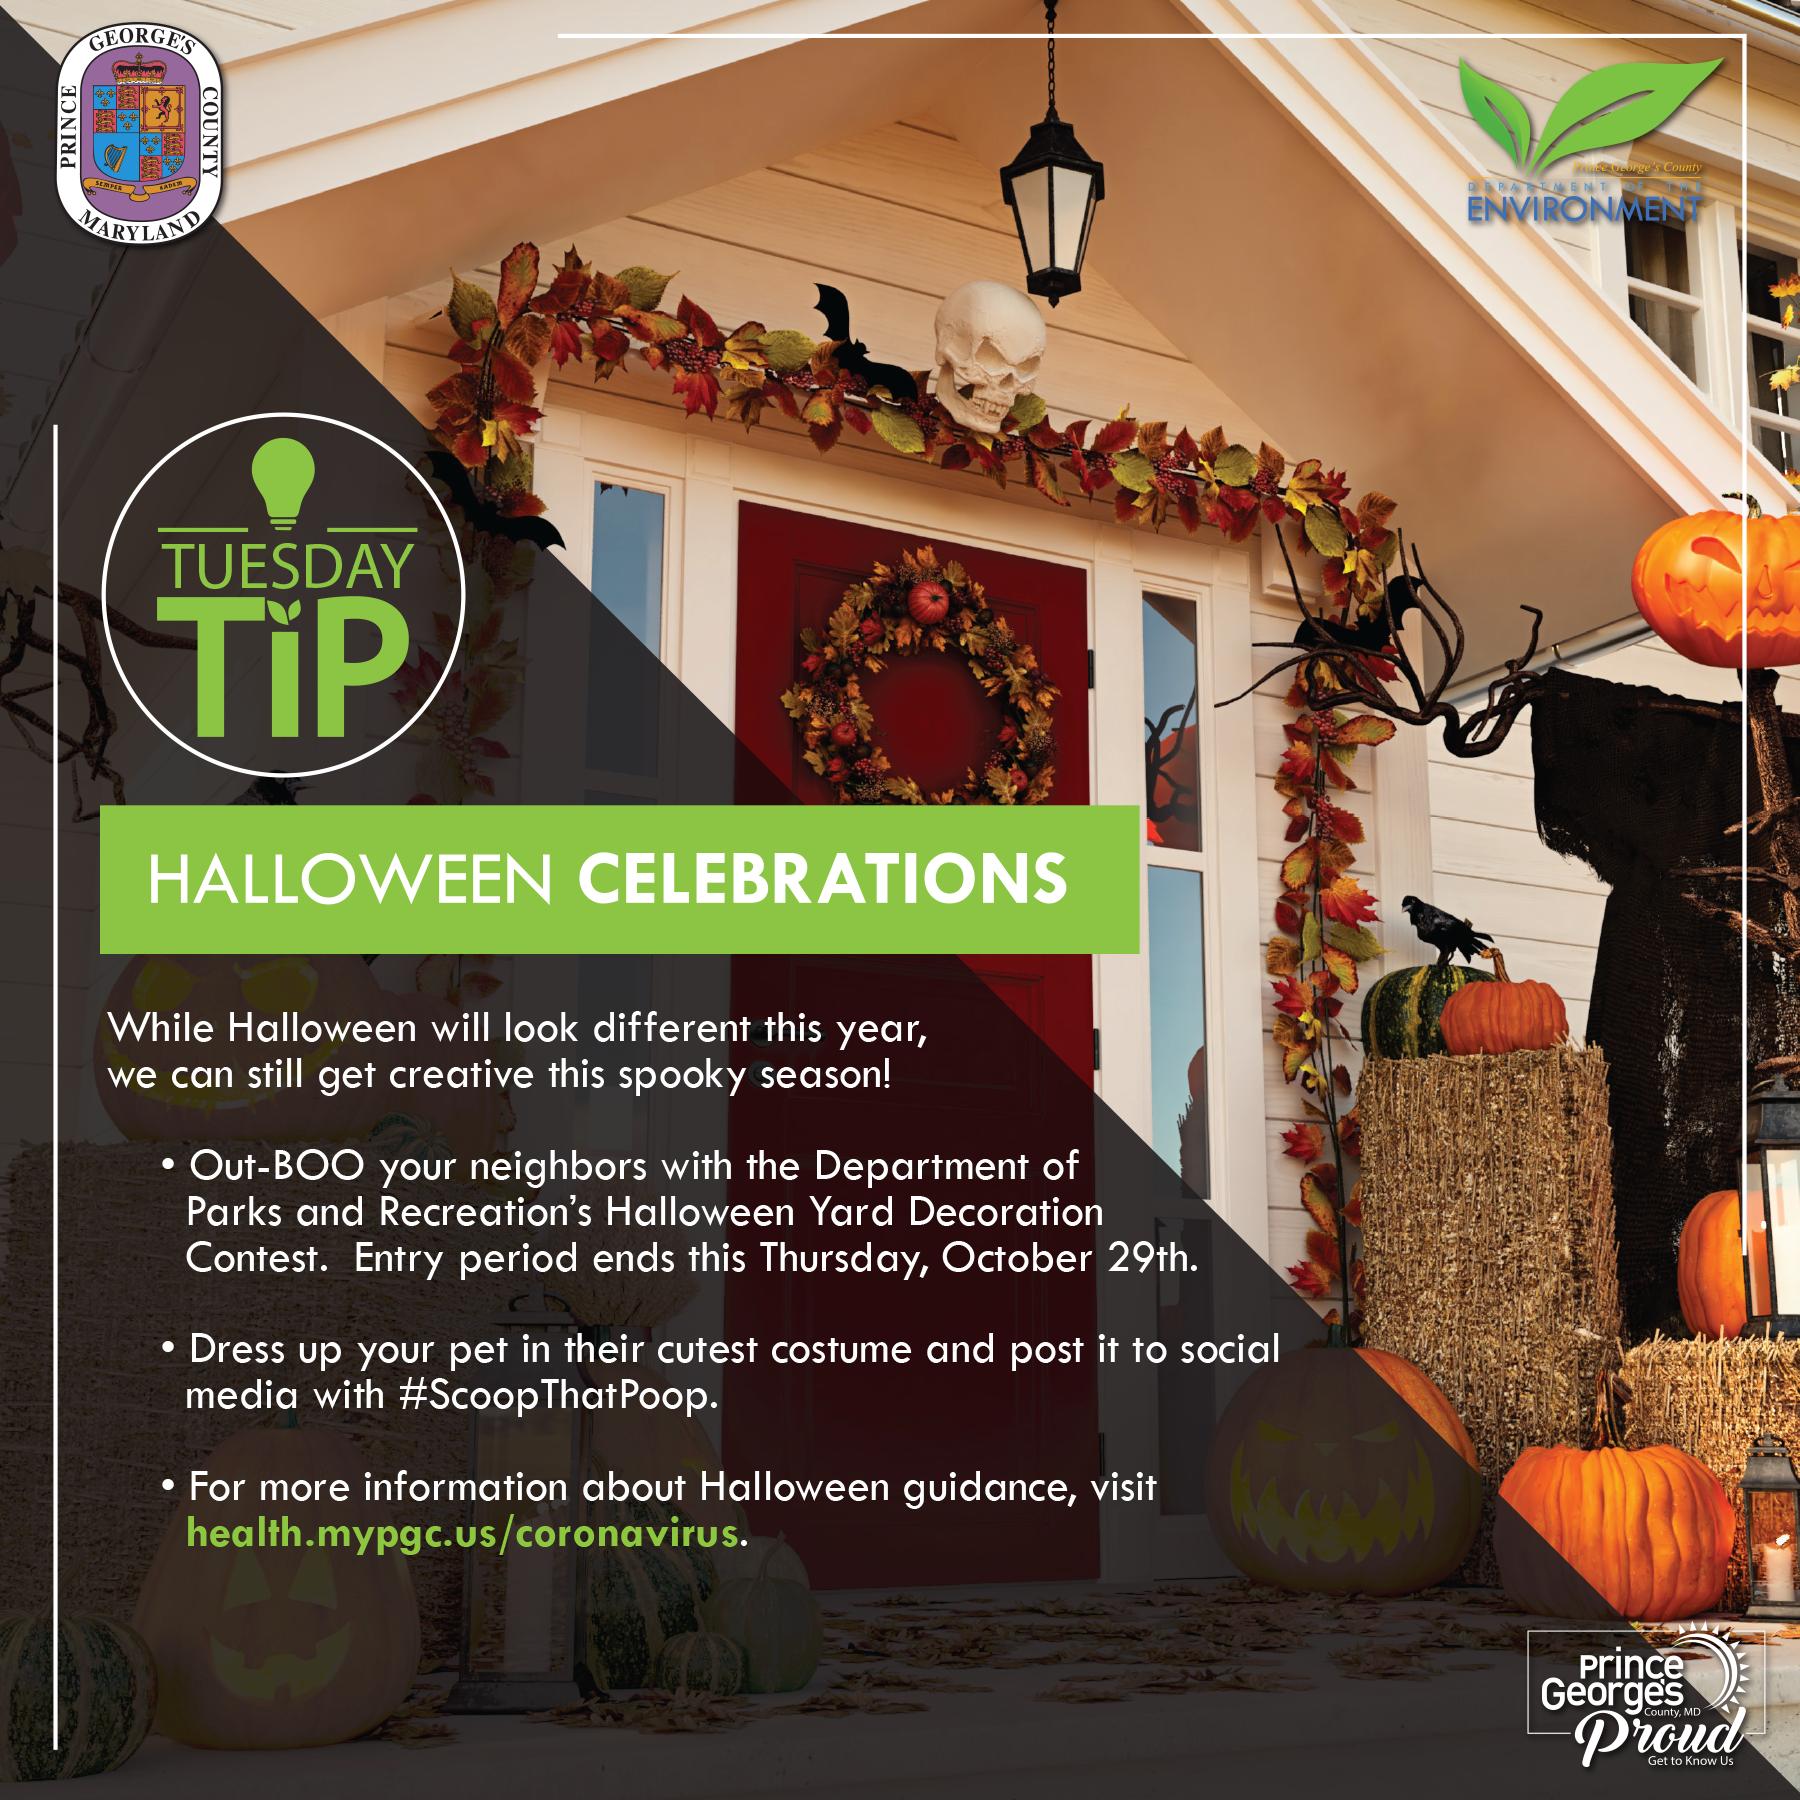 Tues tip 10.27.20 Halloween eng